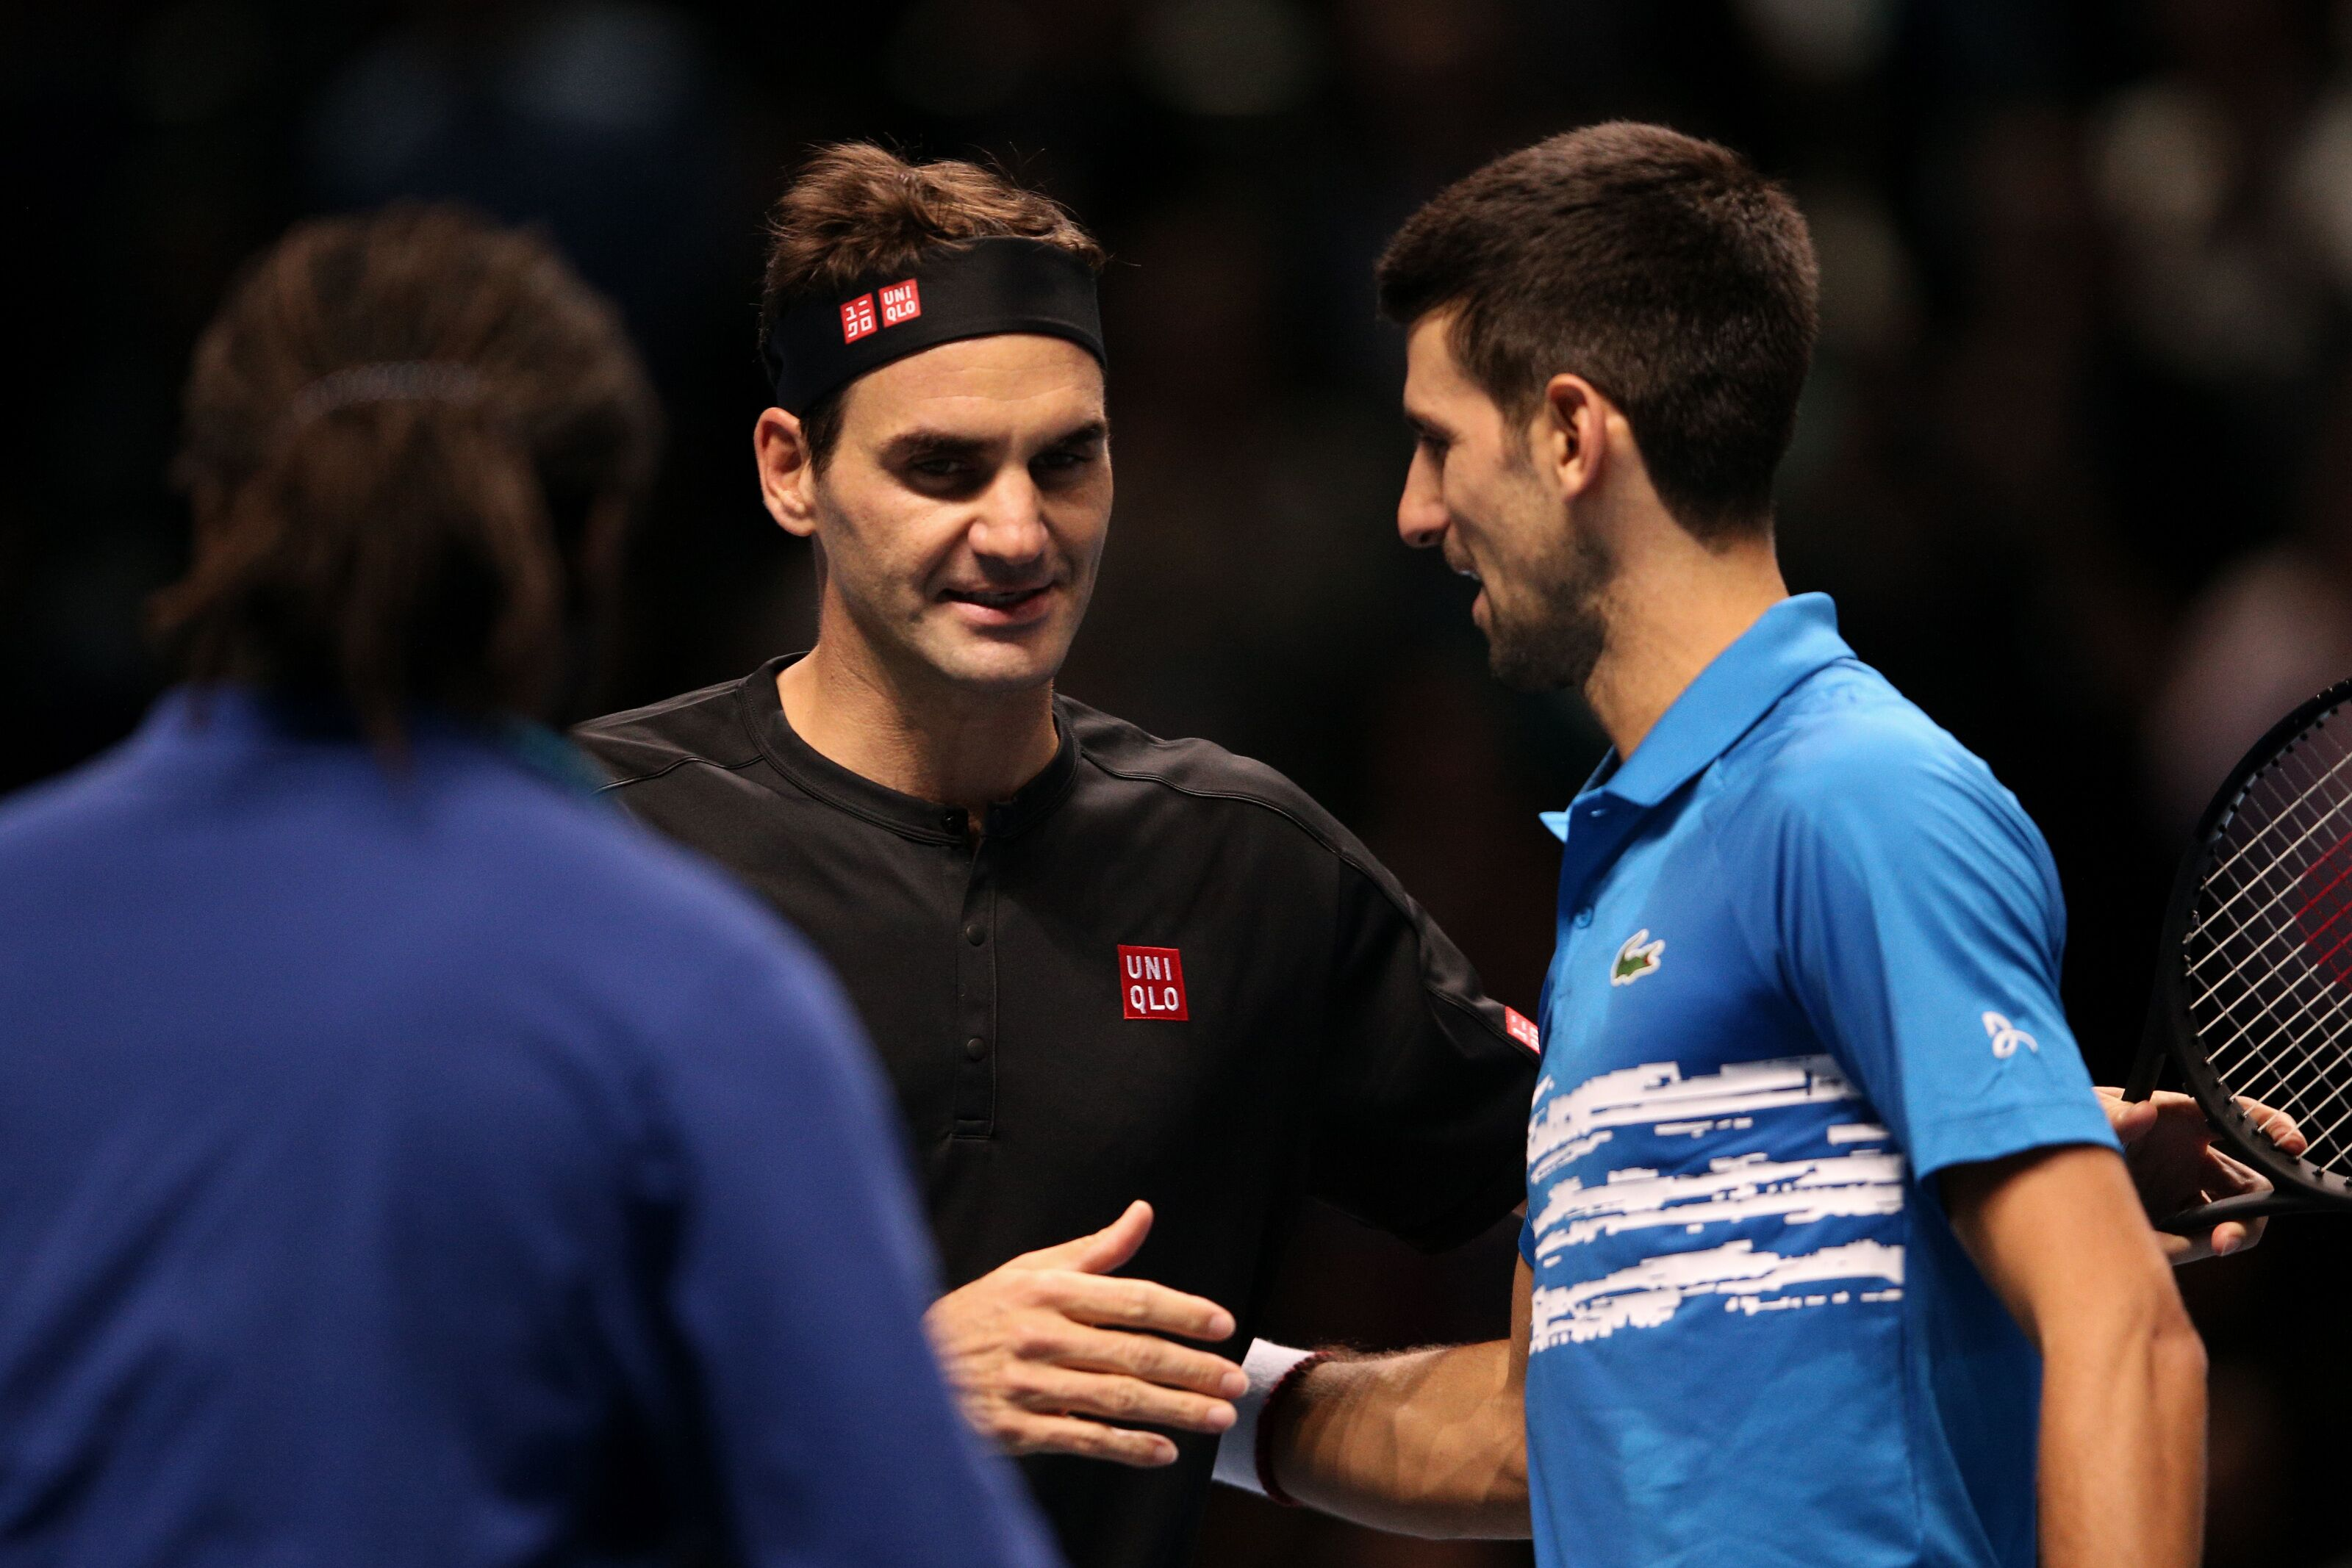 Roger Federer is a 'genius' but Novak Djokovic will surpass his 20 majors